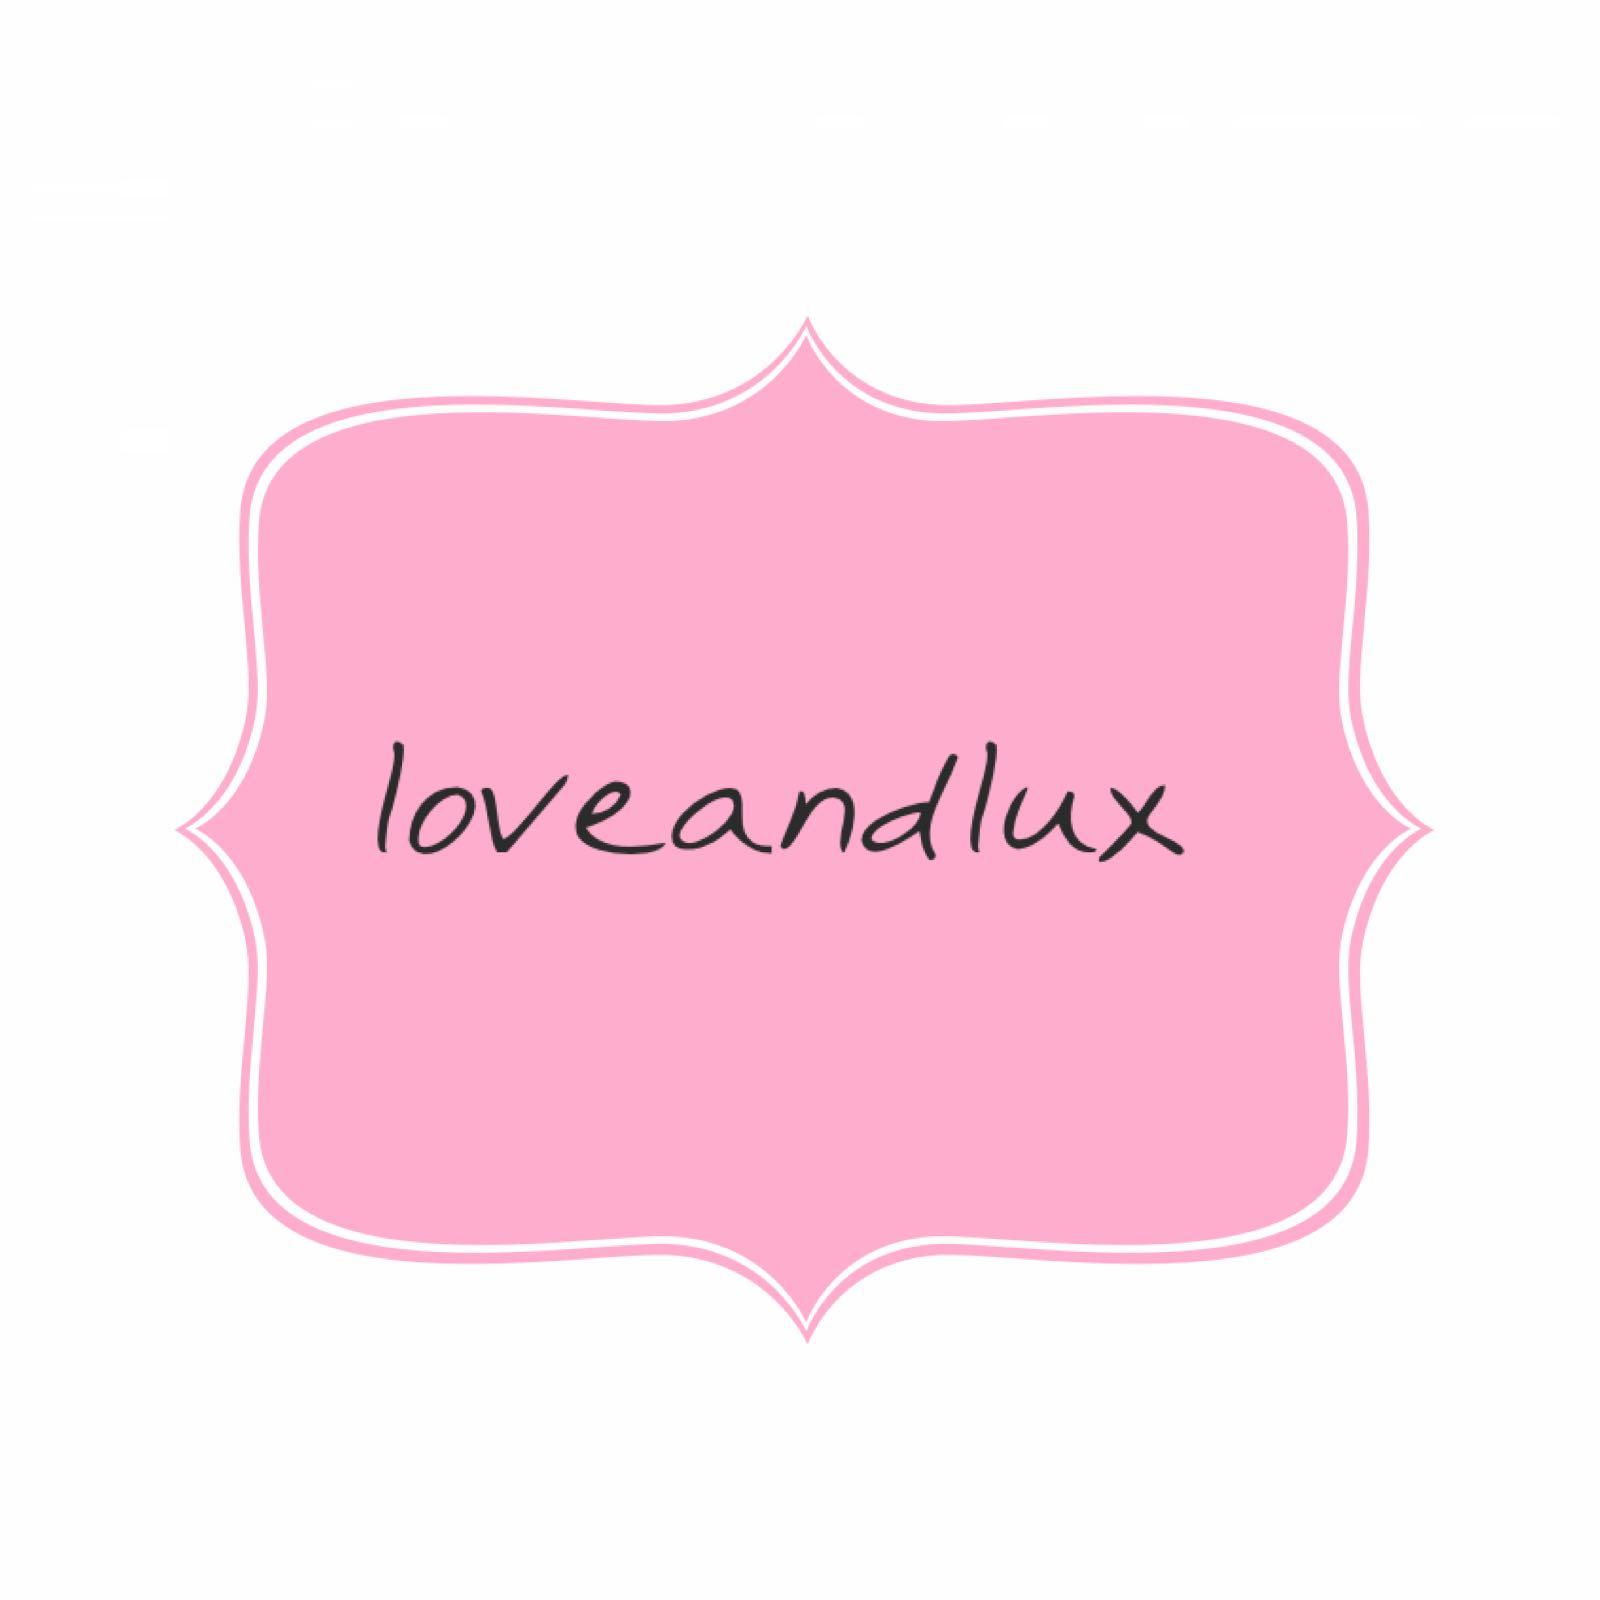 loveandlux